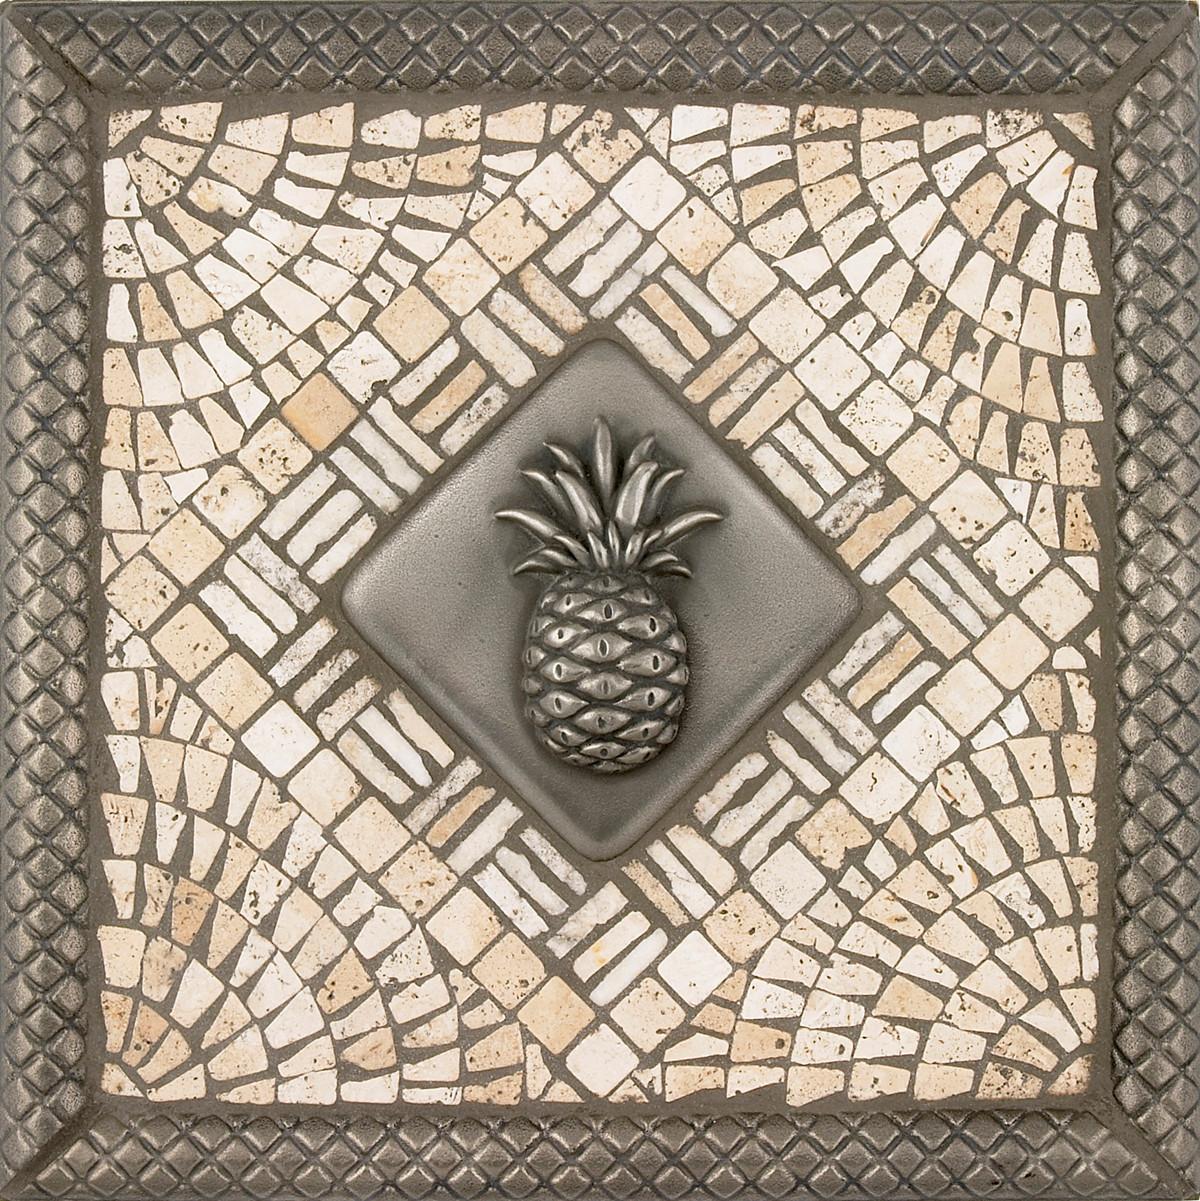 - Metal Pineapple Mosaic Tile Backsplash Medallion 12 Inches